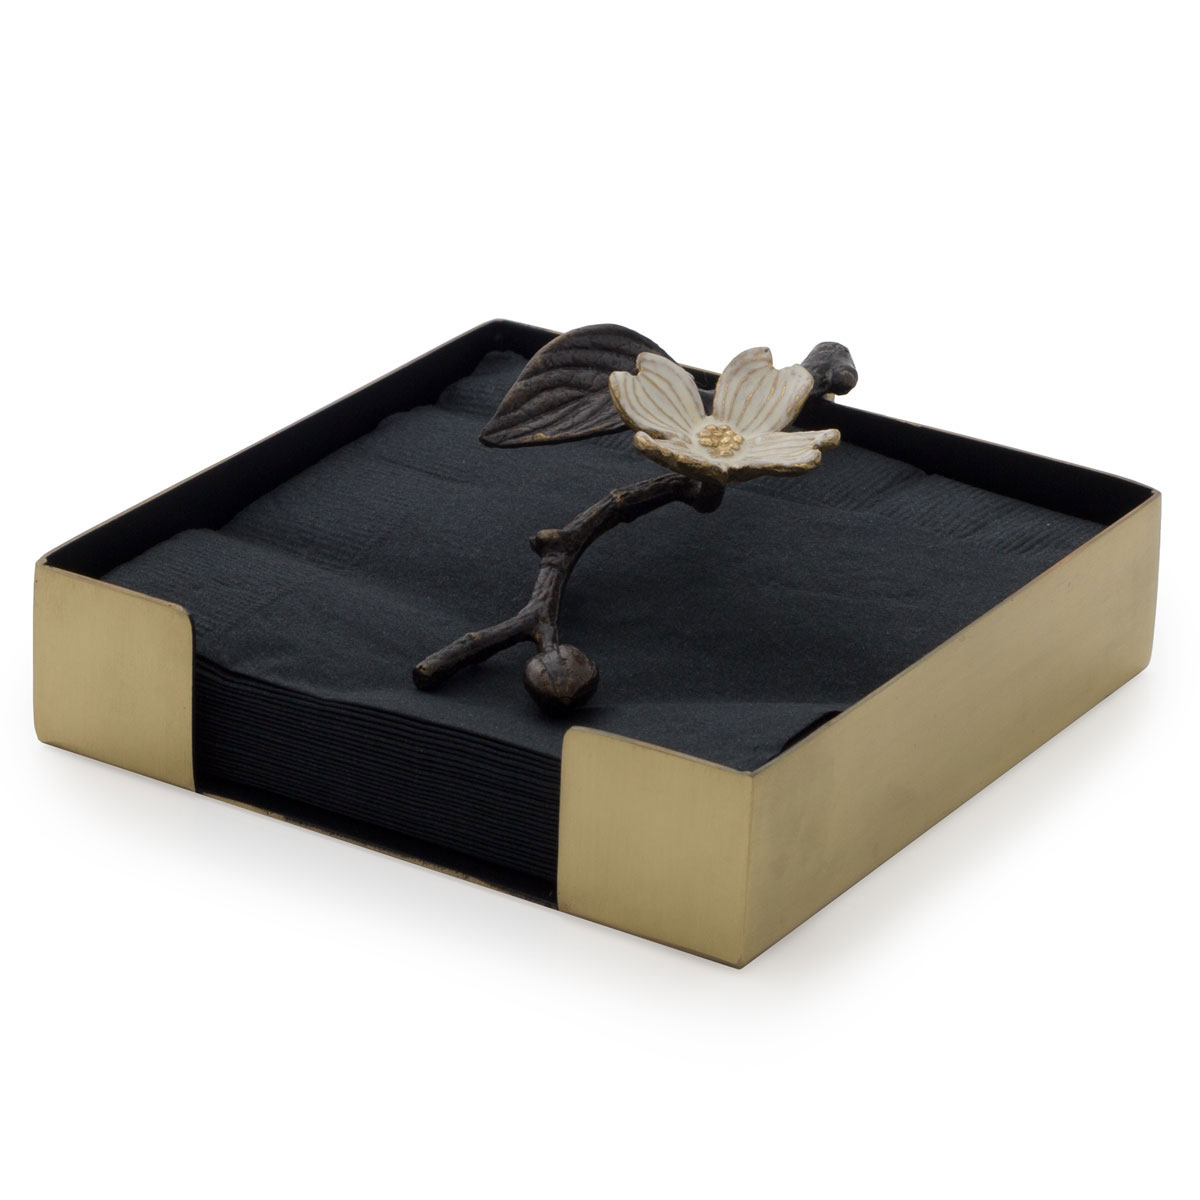 Michael Aram Dogwood Cocktail Napkin Box